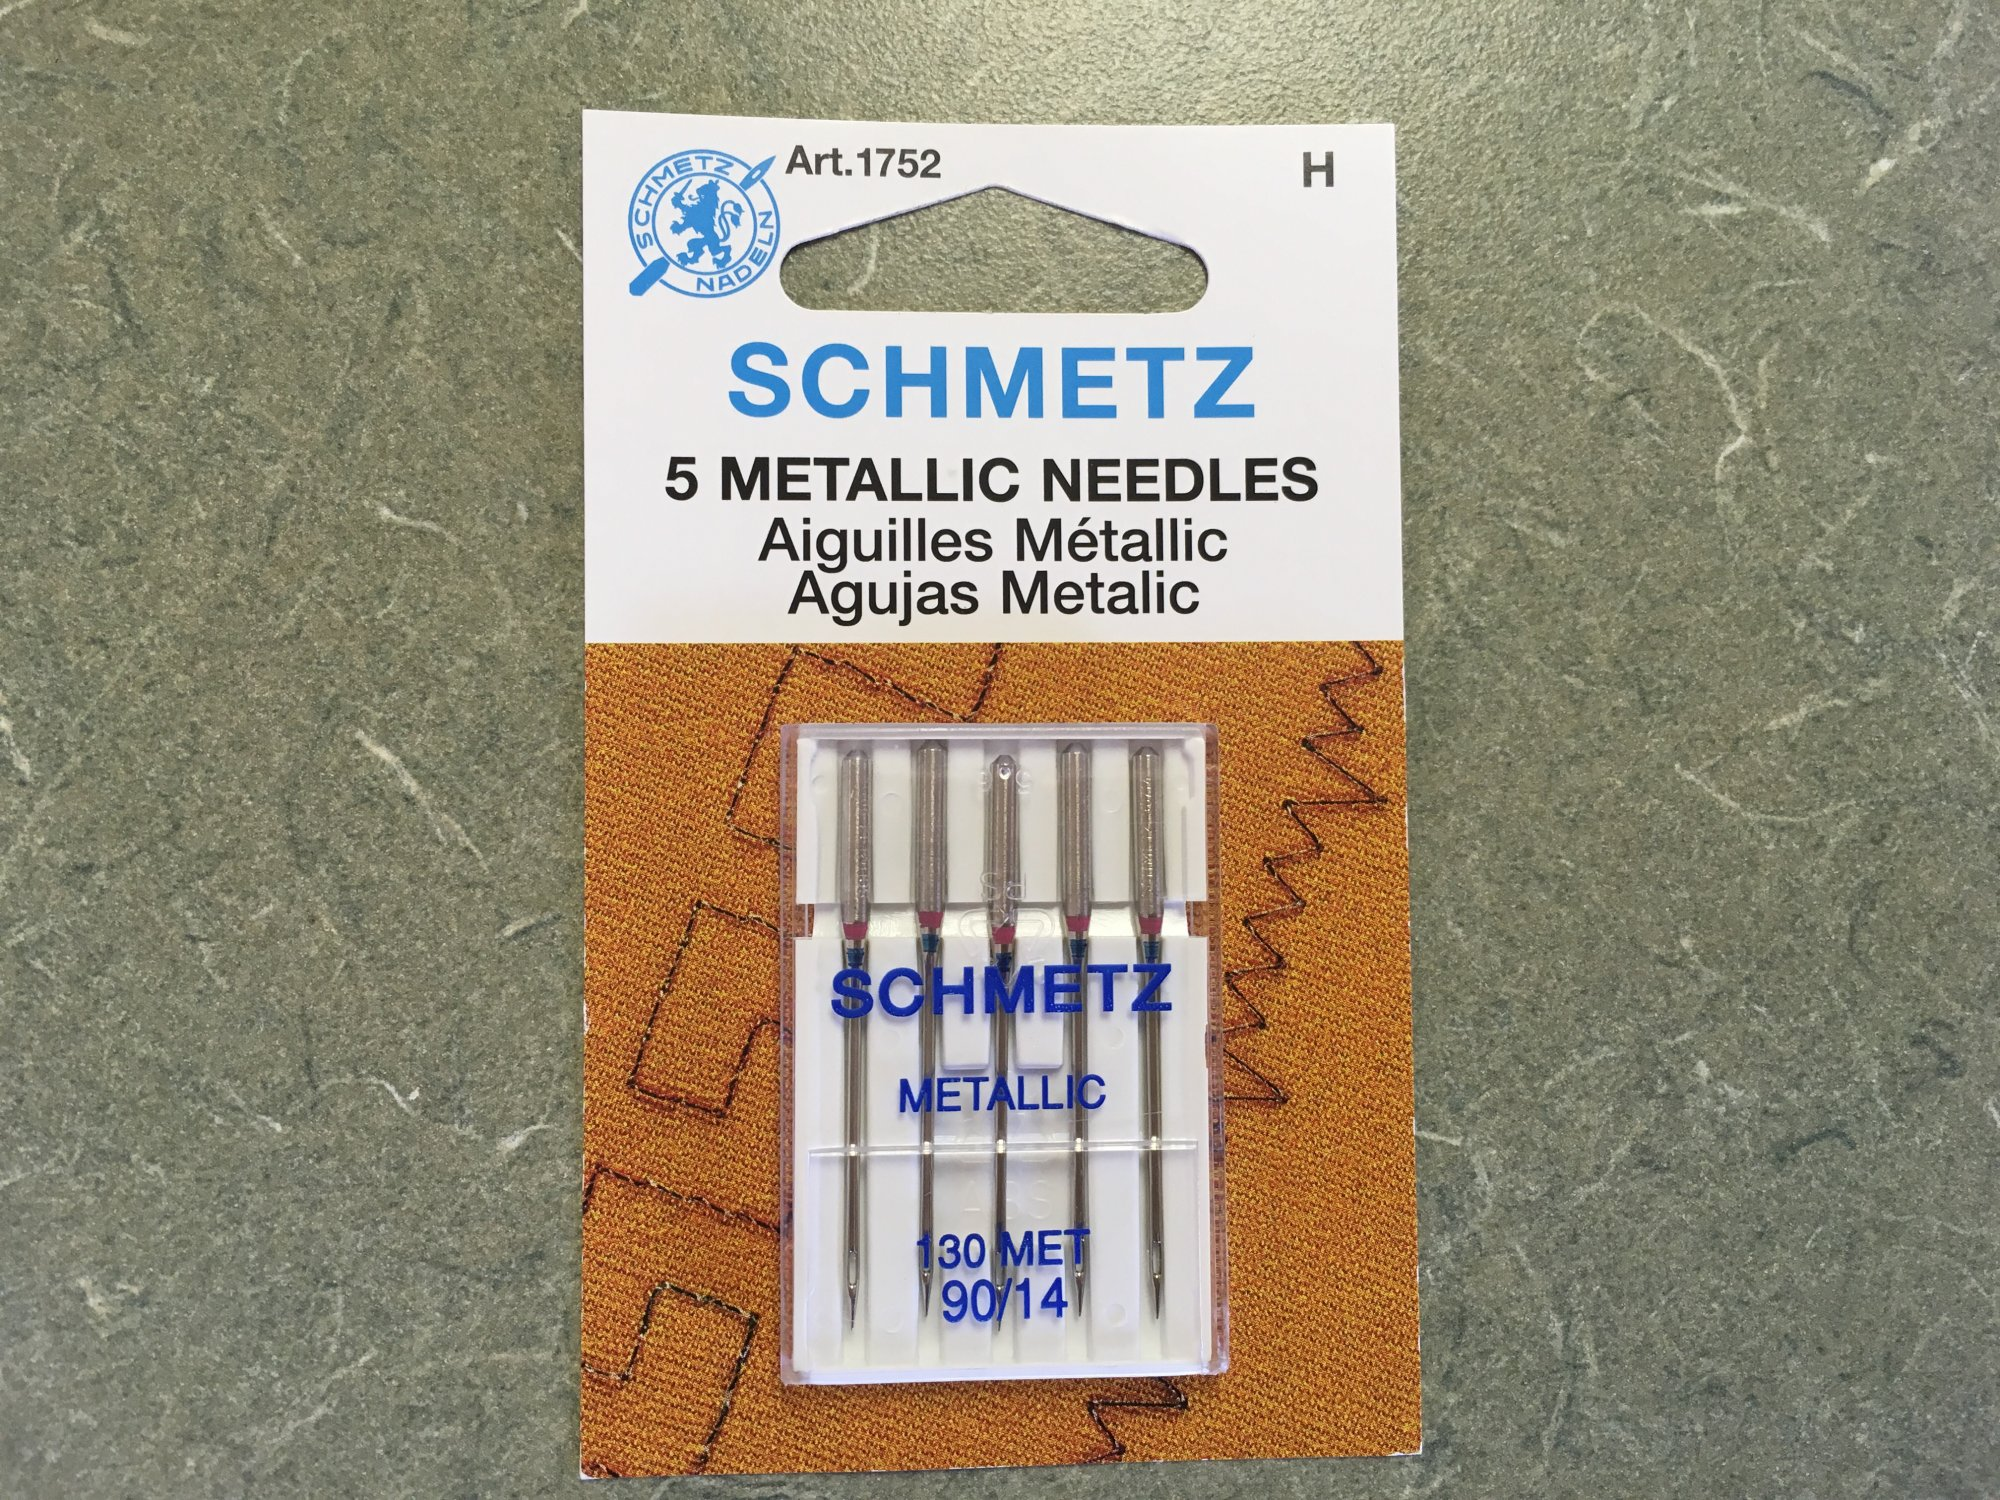 Metallic Needles 90/14 (5 pk) 1752